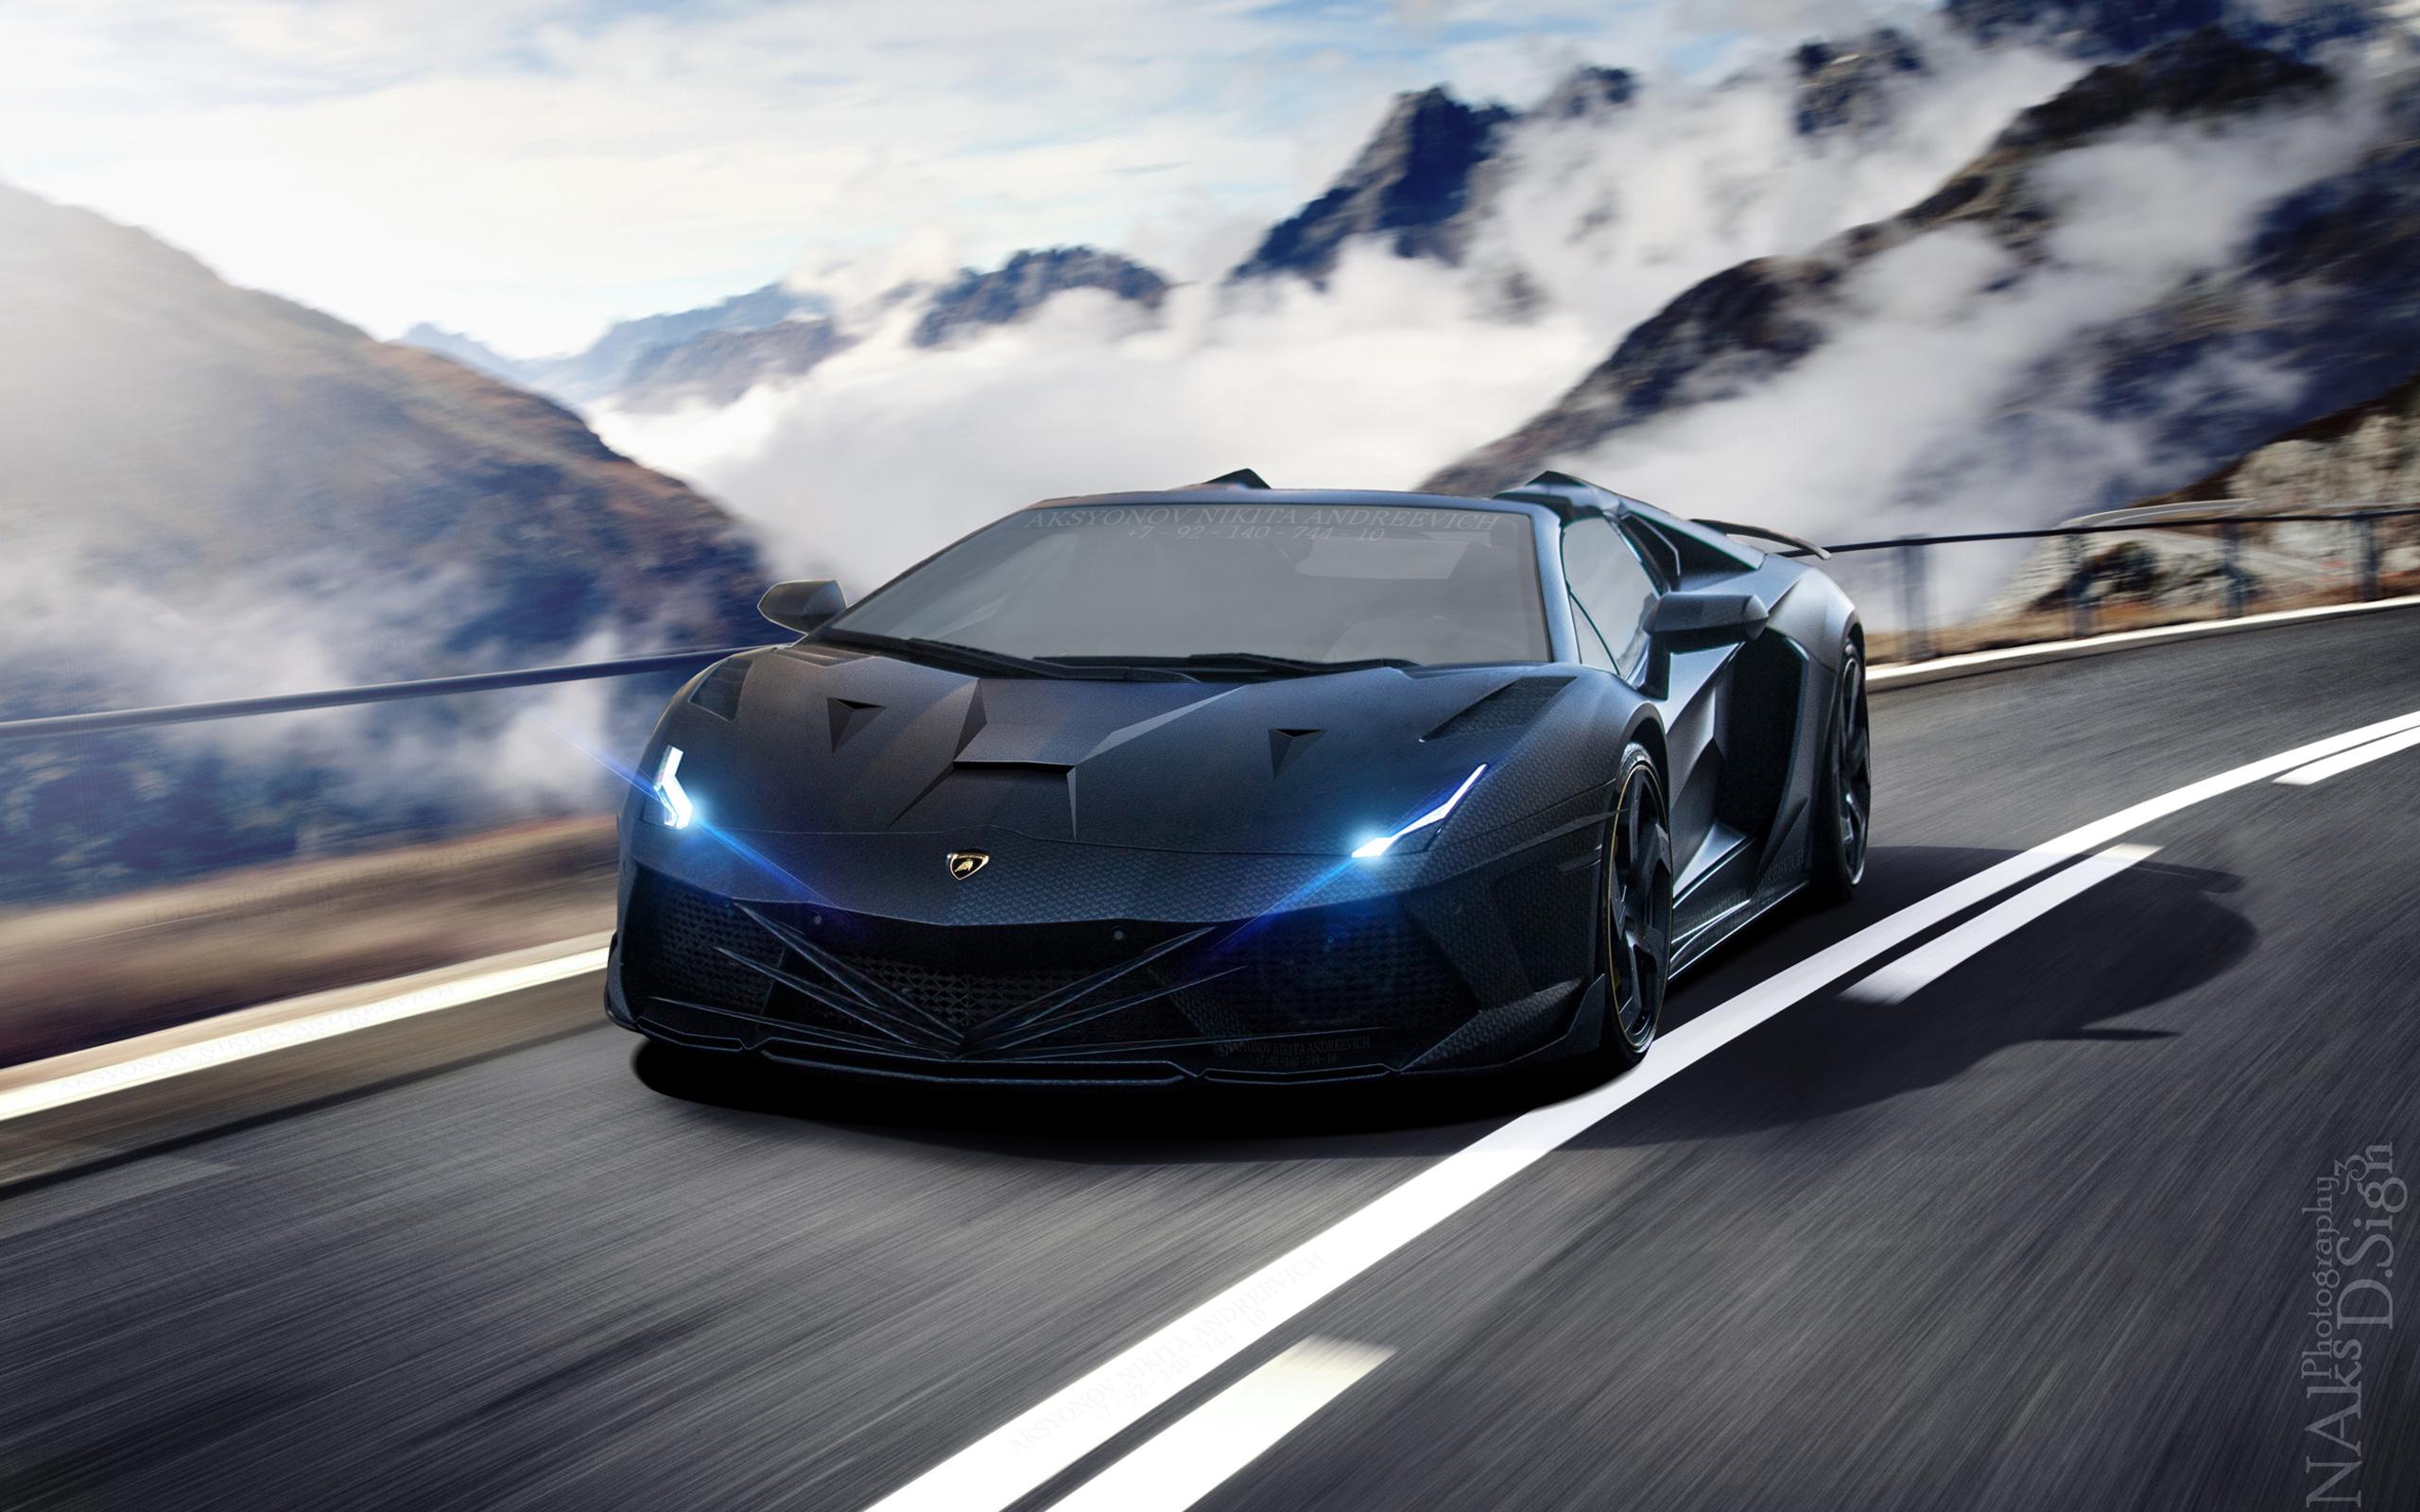 HD Wallpapers Insane Lamborghini Aventador